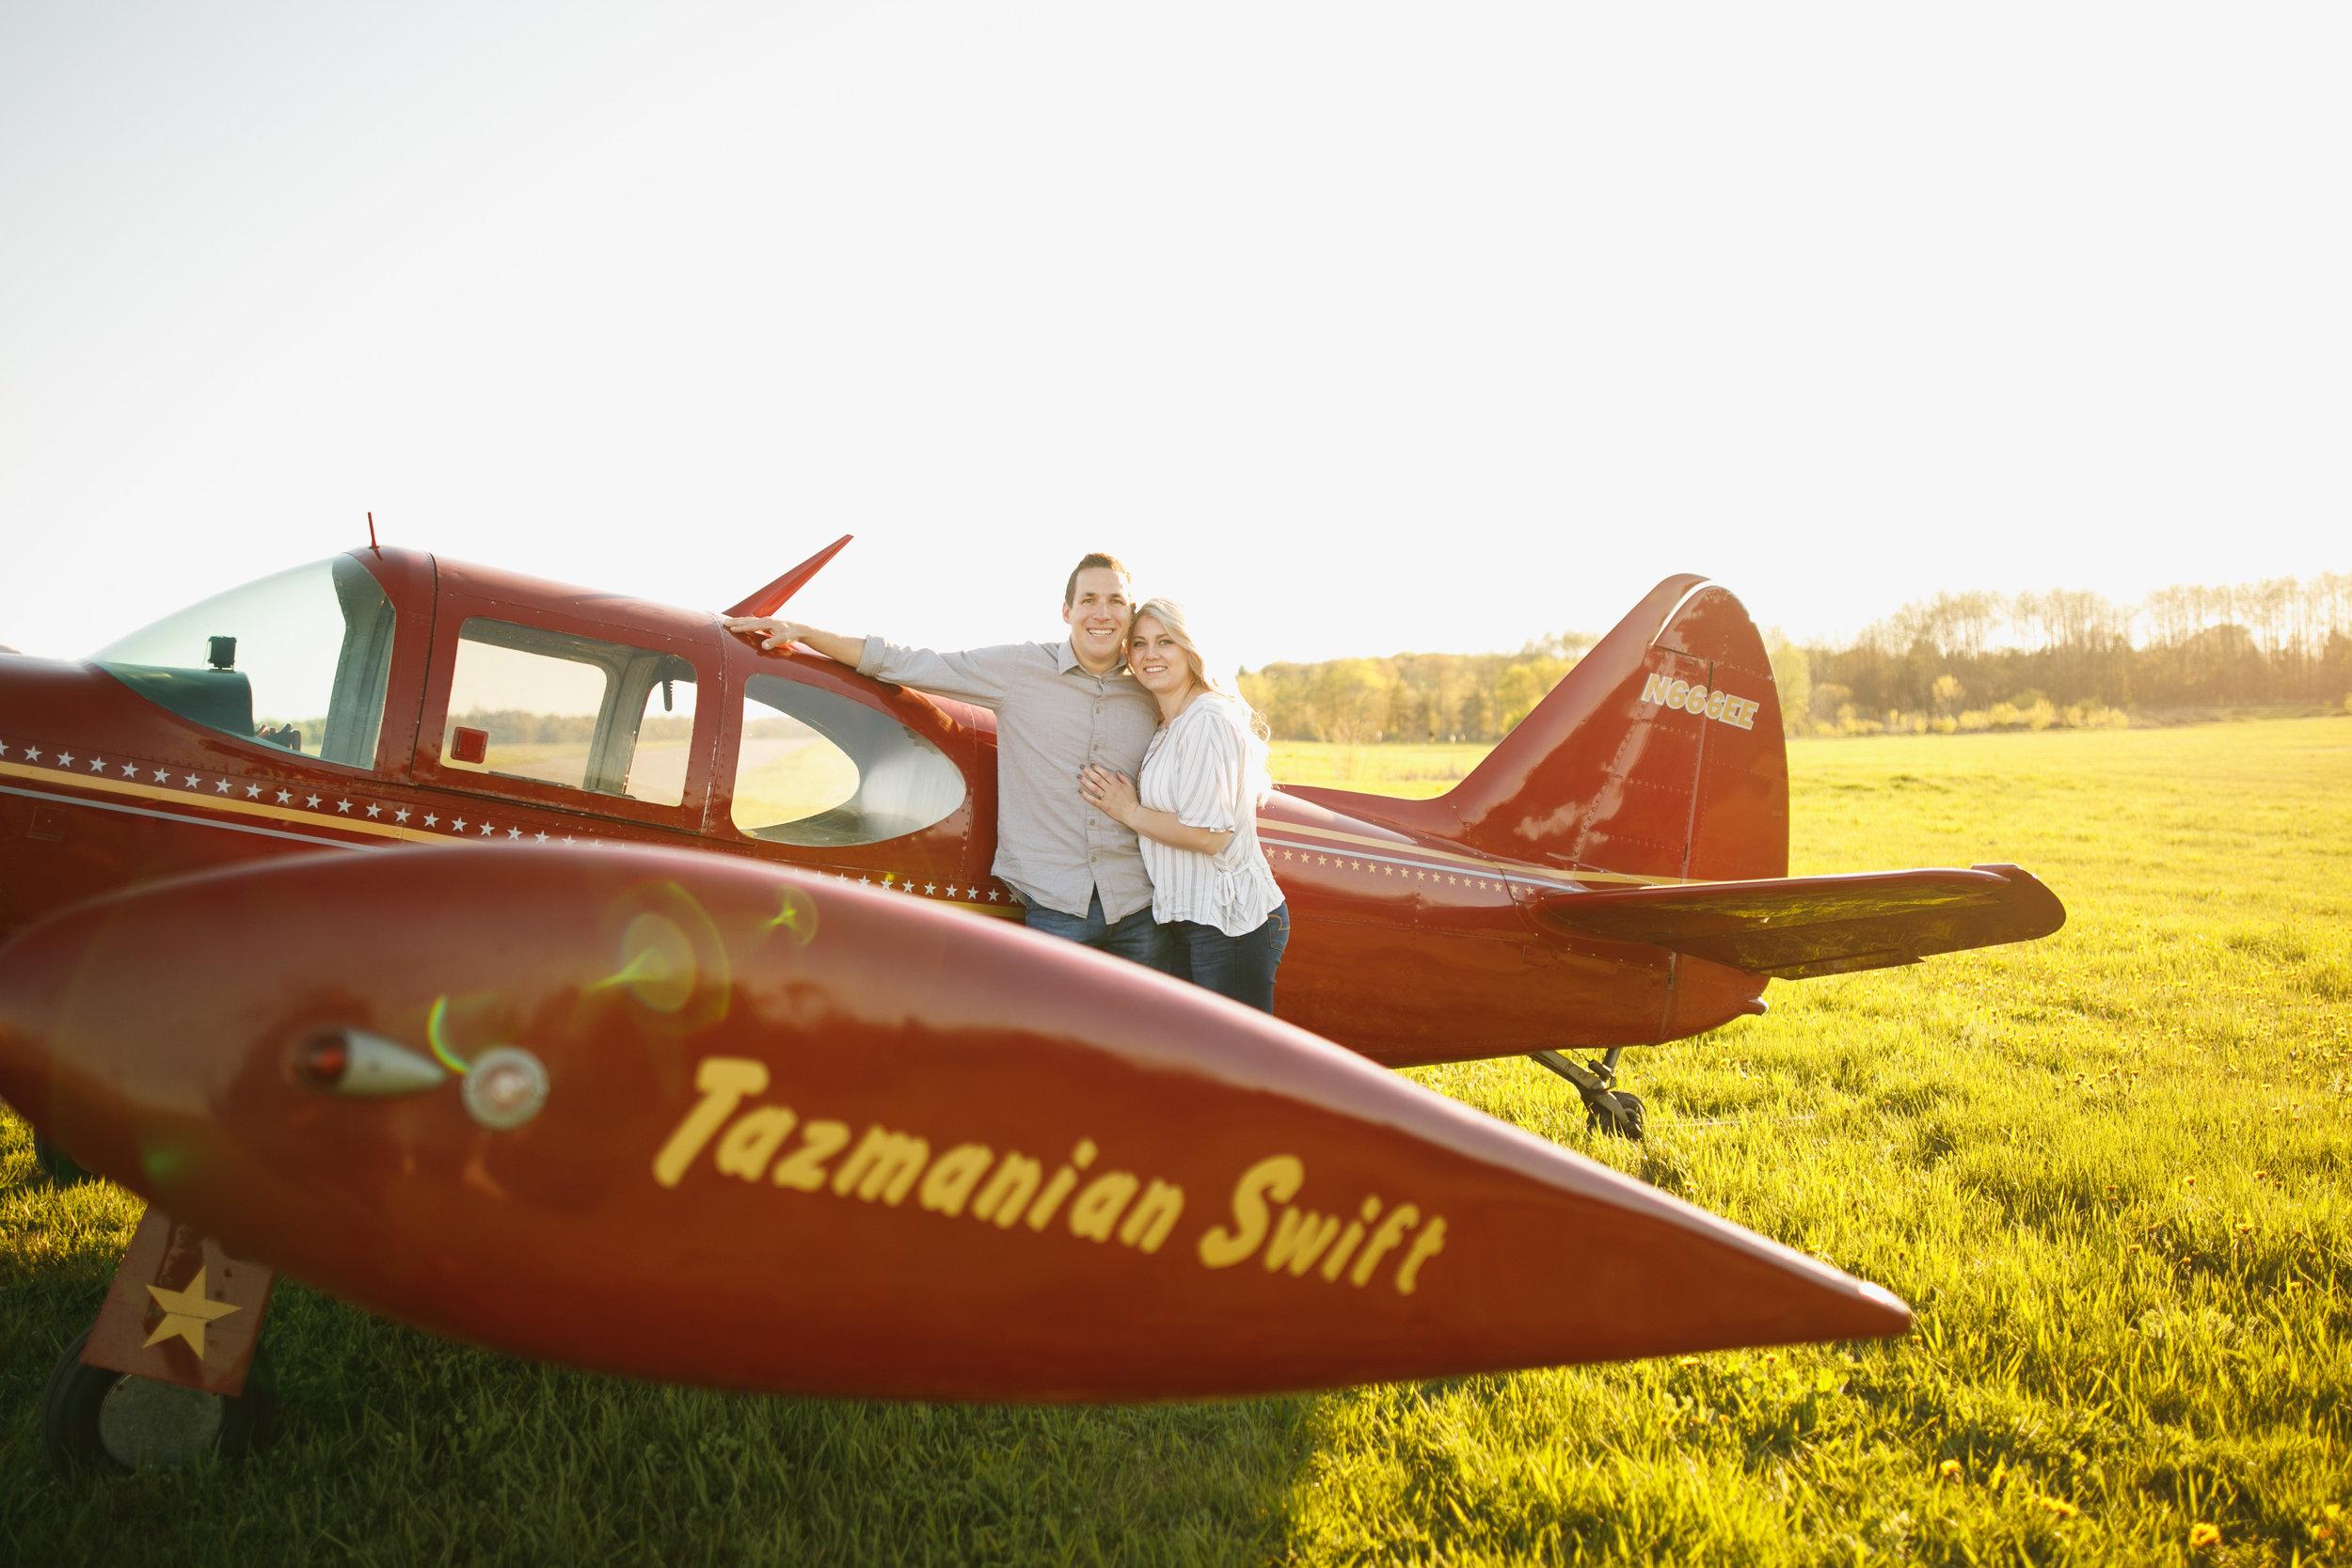 Grand Rapids Photographer - J Darling Photo - jessica darling - grand rapids wedding photographer - sparta airport - sparta michigan - jasmine and jeff engaged 033.jpg